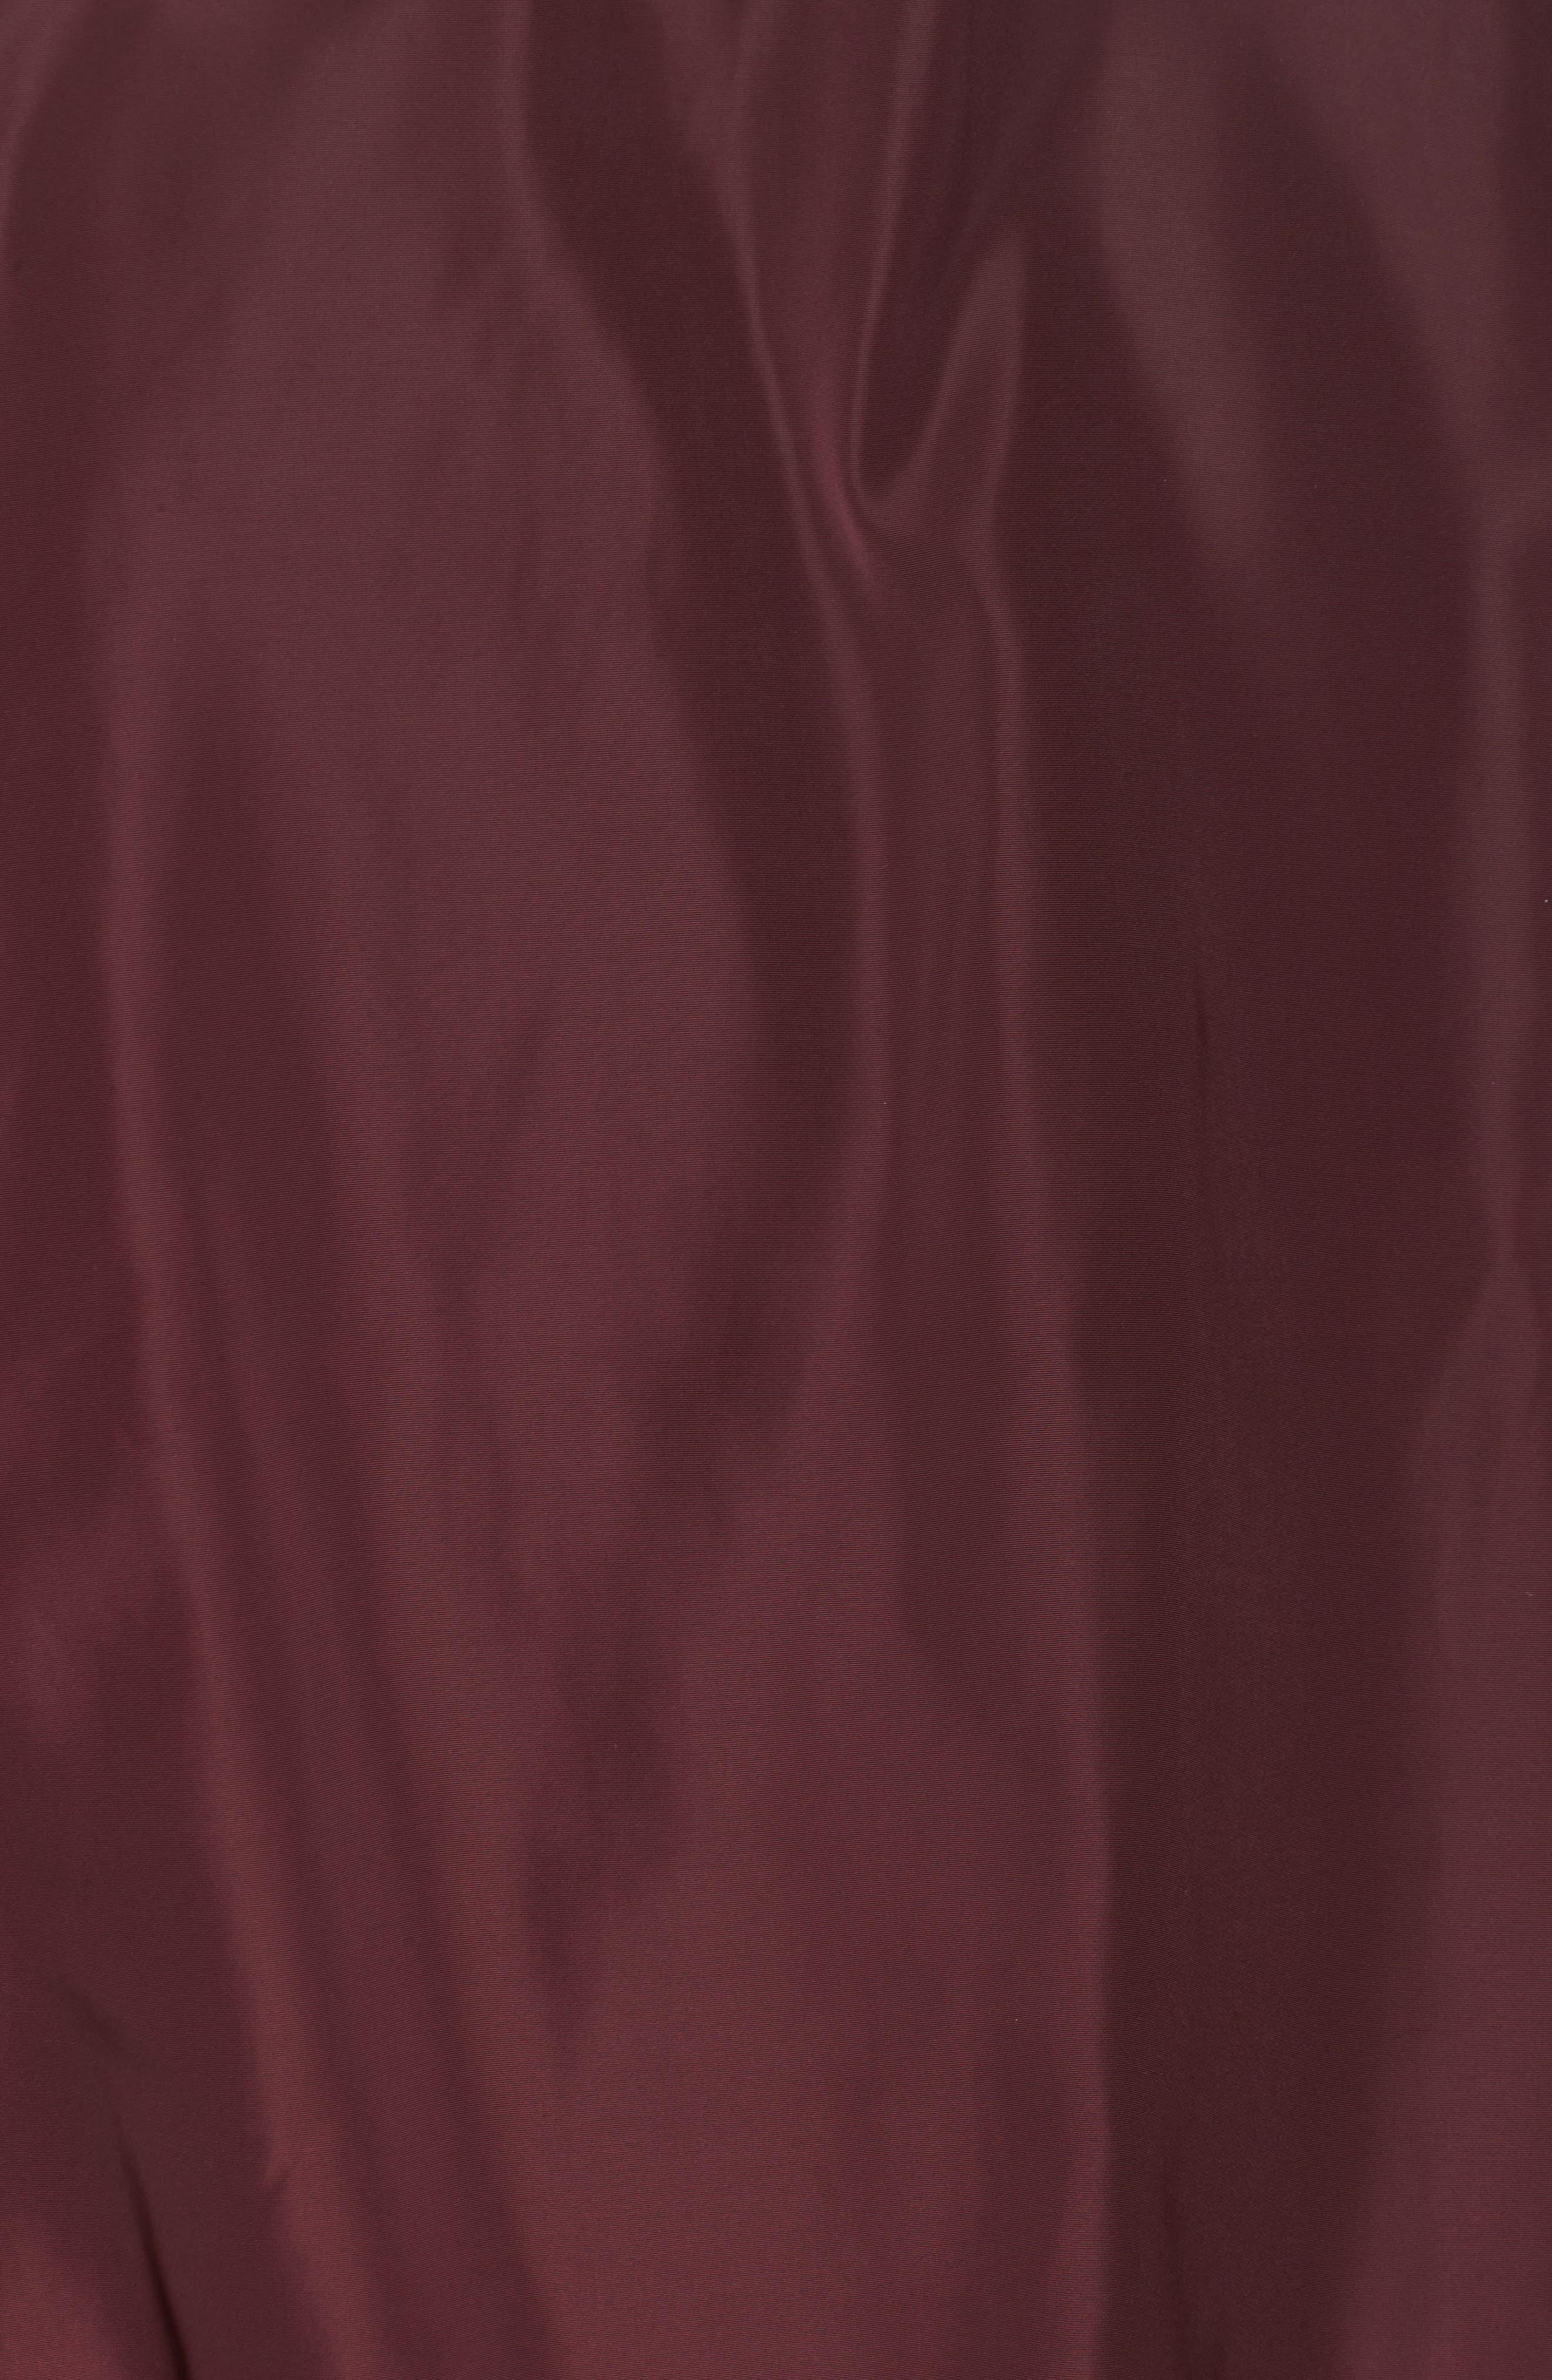 Elton Bomber Jacket,                             Alternate thumbnail 6, color,                             930